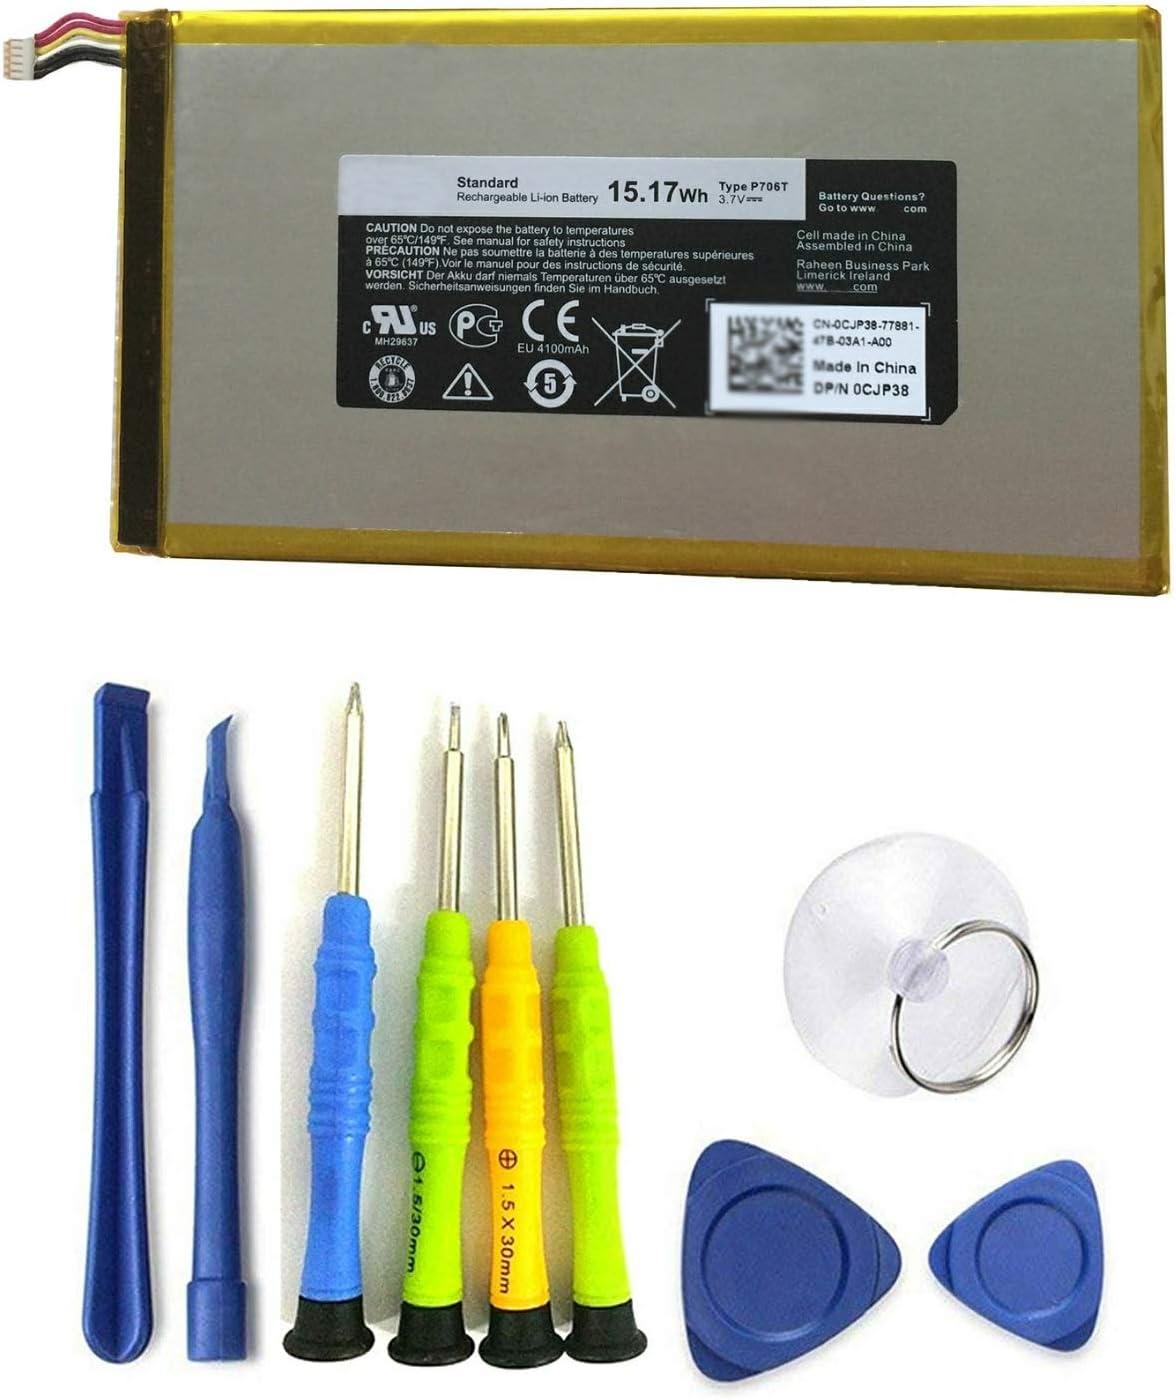 Dentsing 3.7V 15.17Wh/4100mAh P706T Laptop Battery for DELL Venue 7 3730 8 3830 Series Tablet Notebook T01C T02D